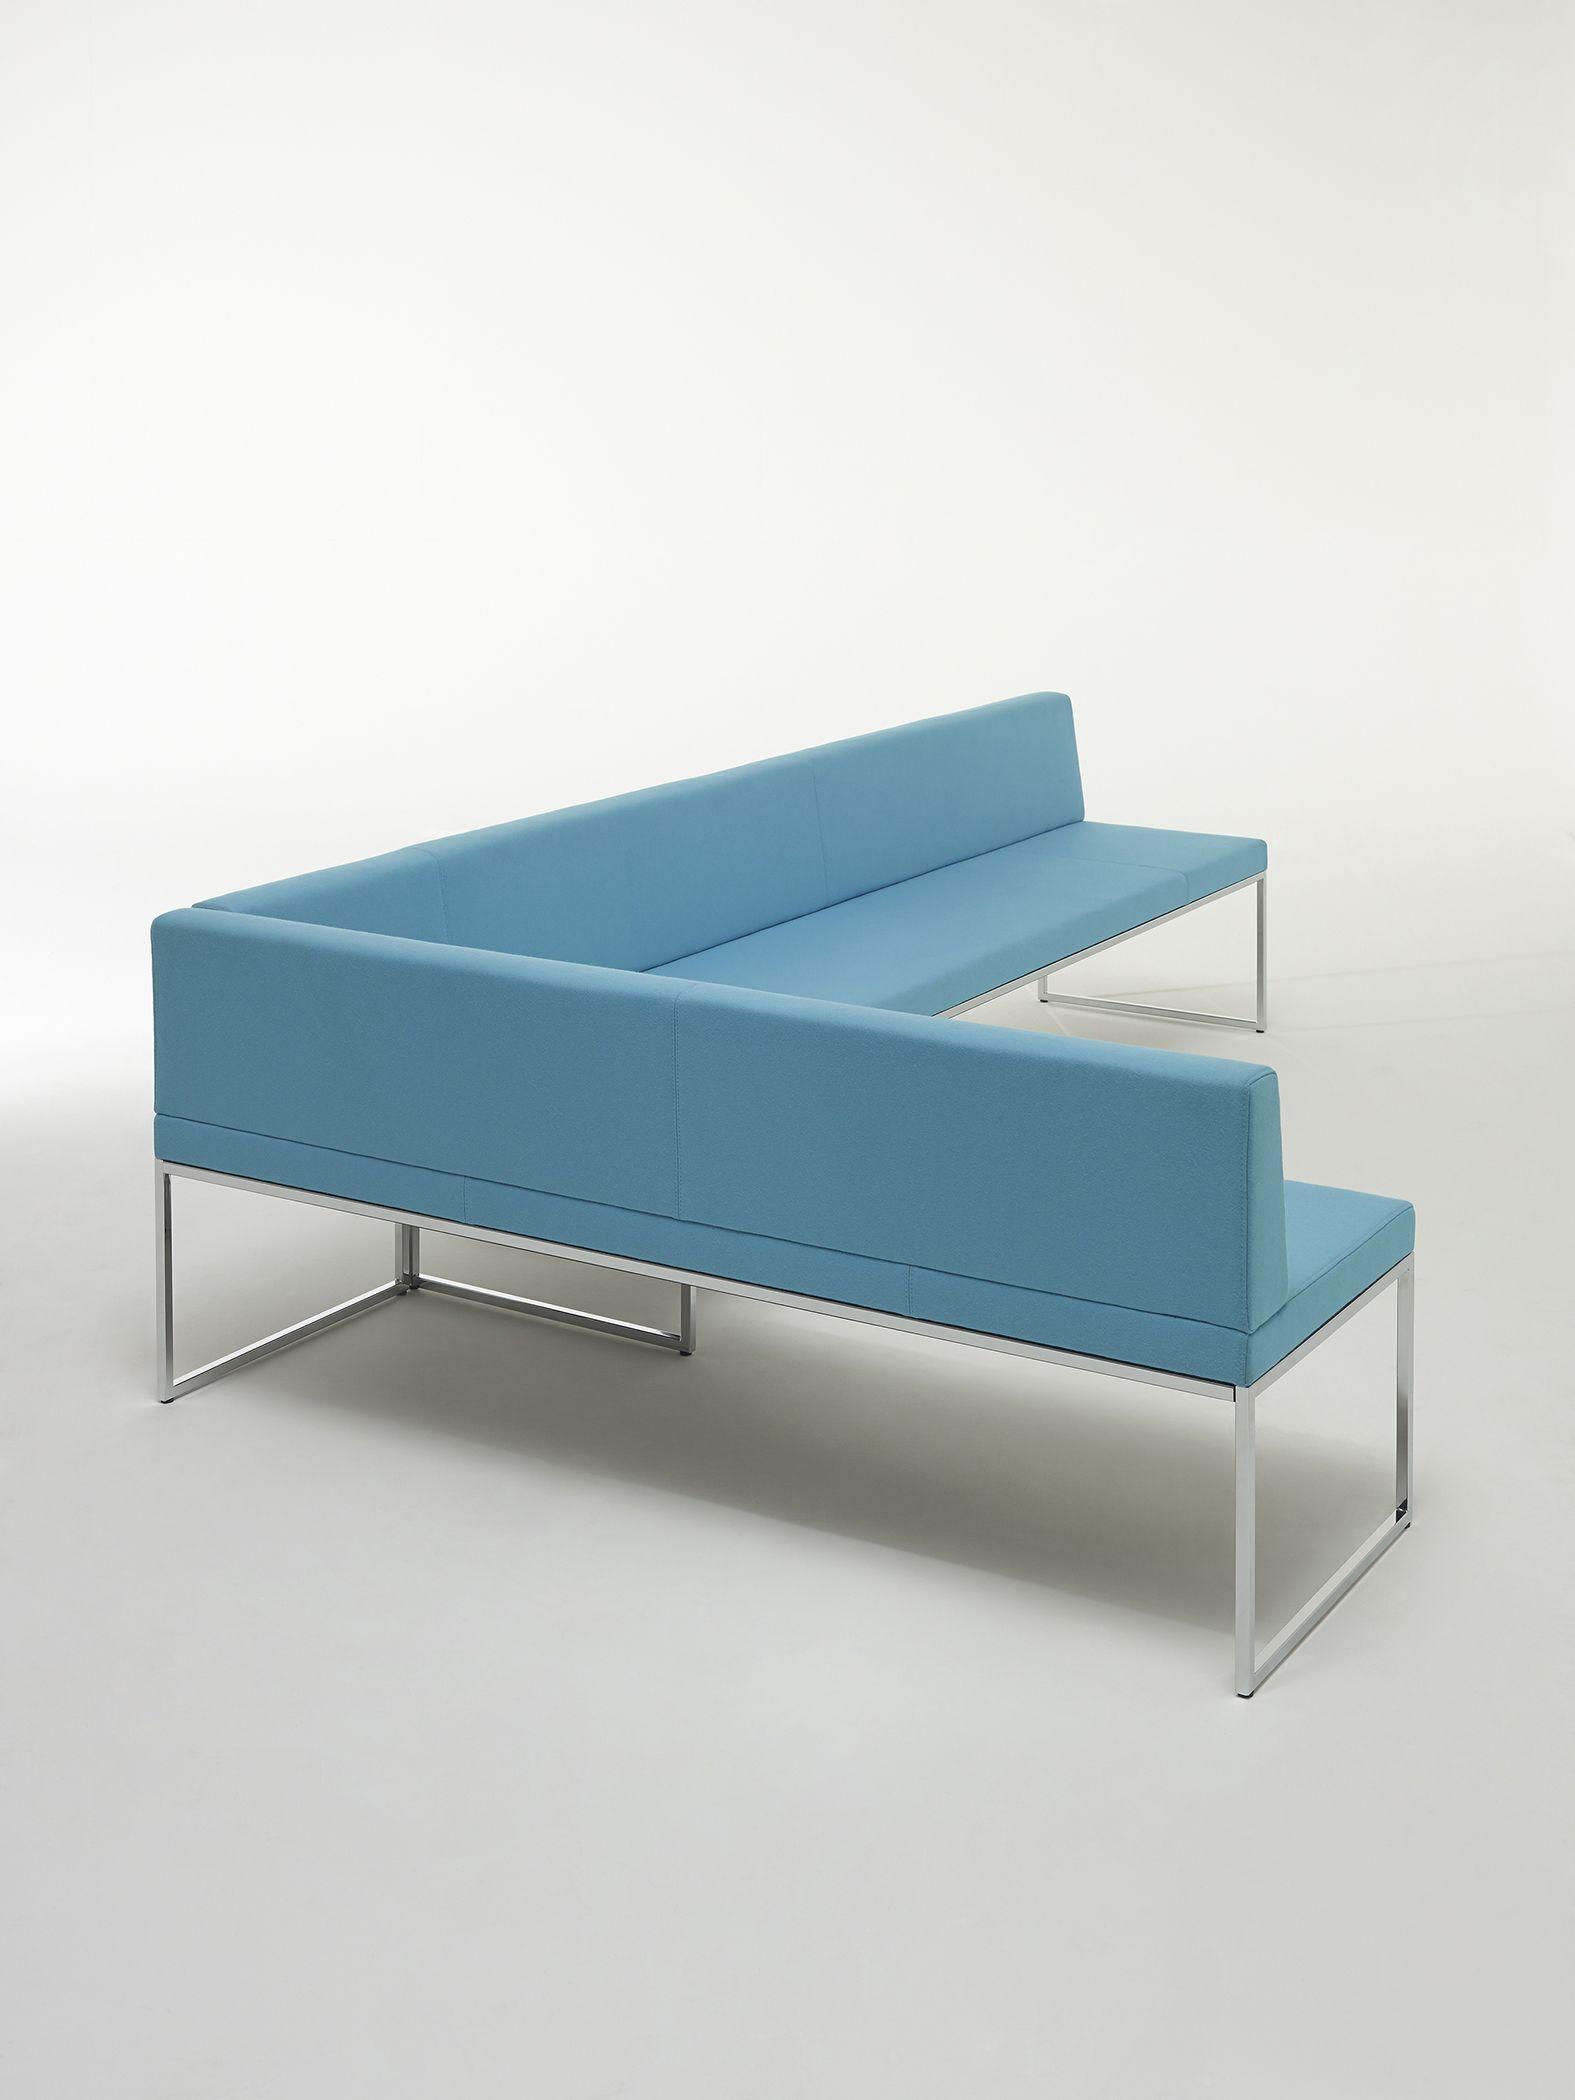 Modo Upright Lounge From Davis Furniture